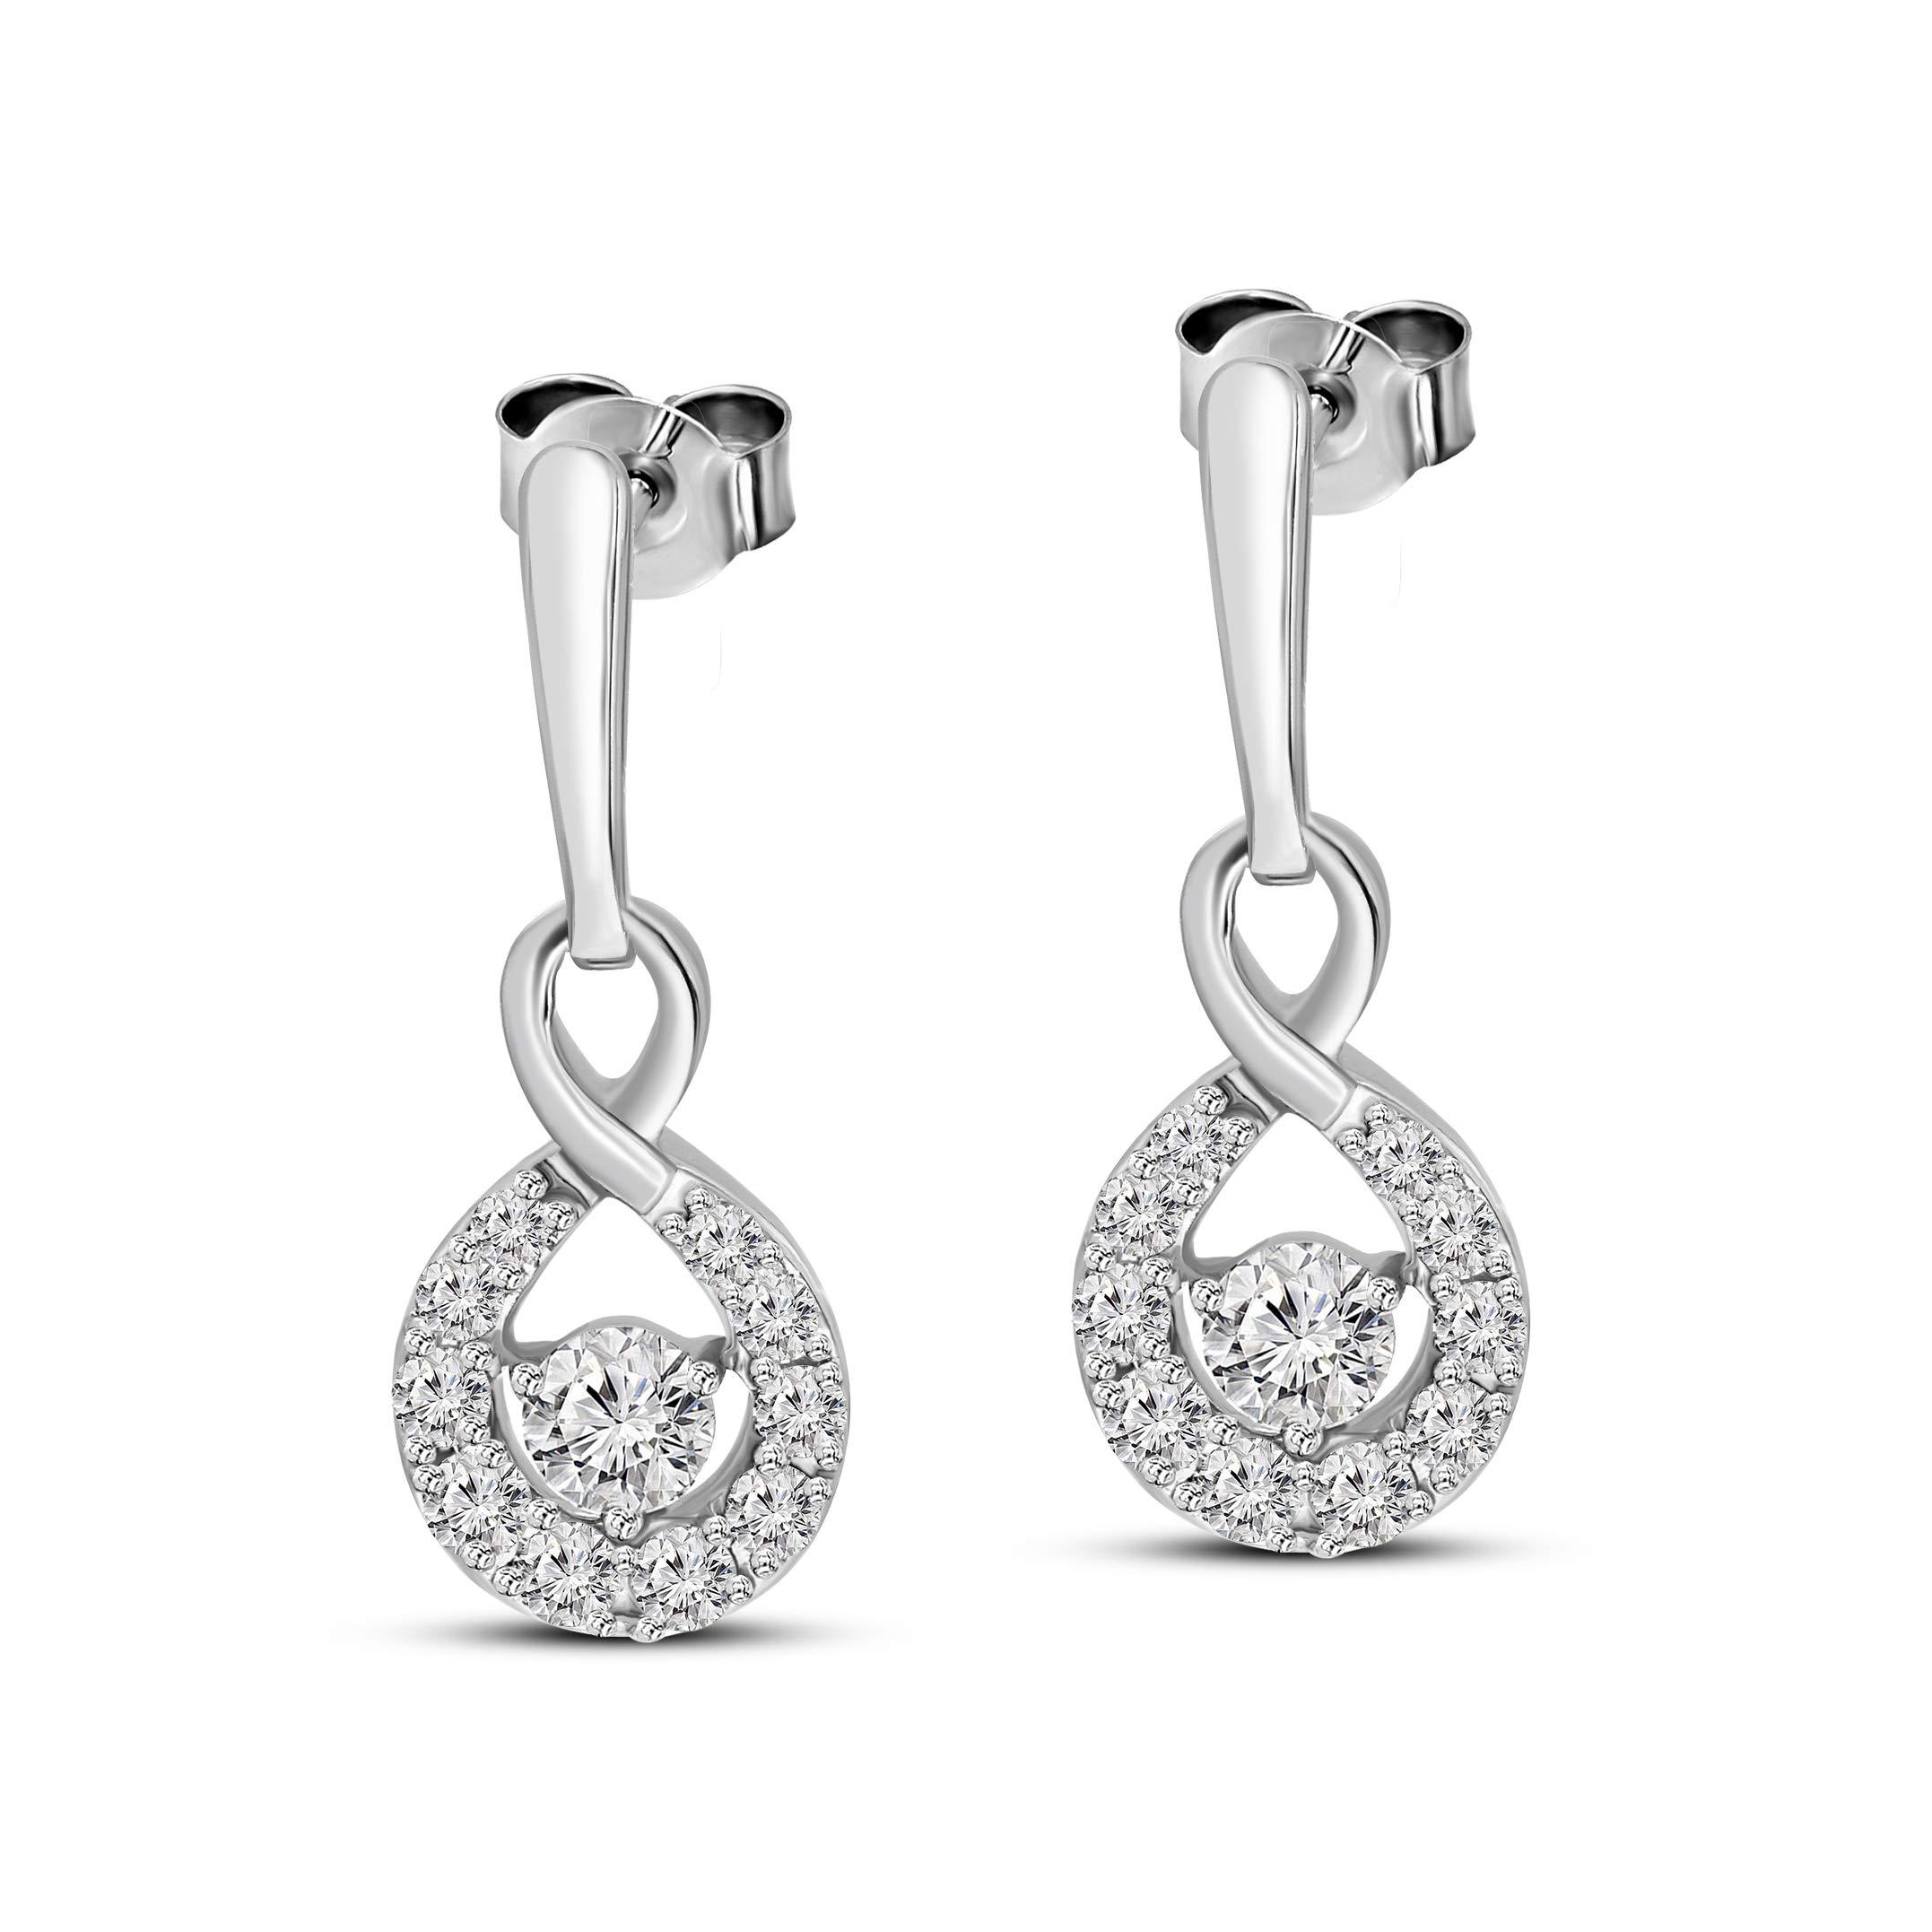 Natural Diamond Earrings 1 Carat Dangling Diamond Earrings For Women 14K White Gold Real Diamond Earrings Diamond Jewelry Gifts For Women